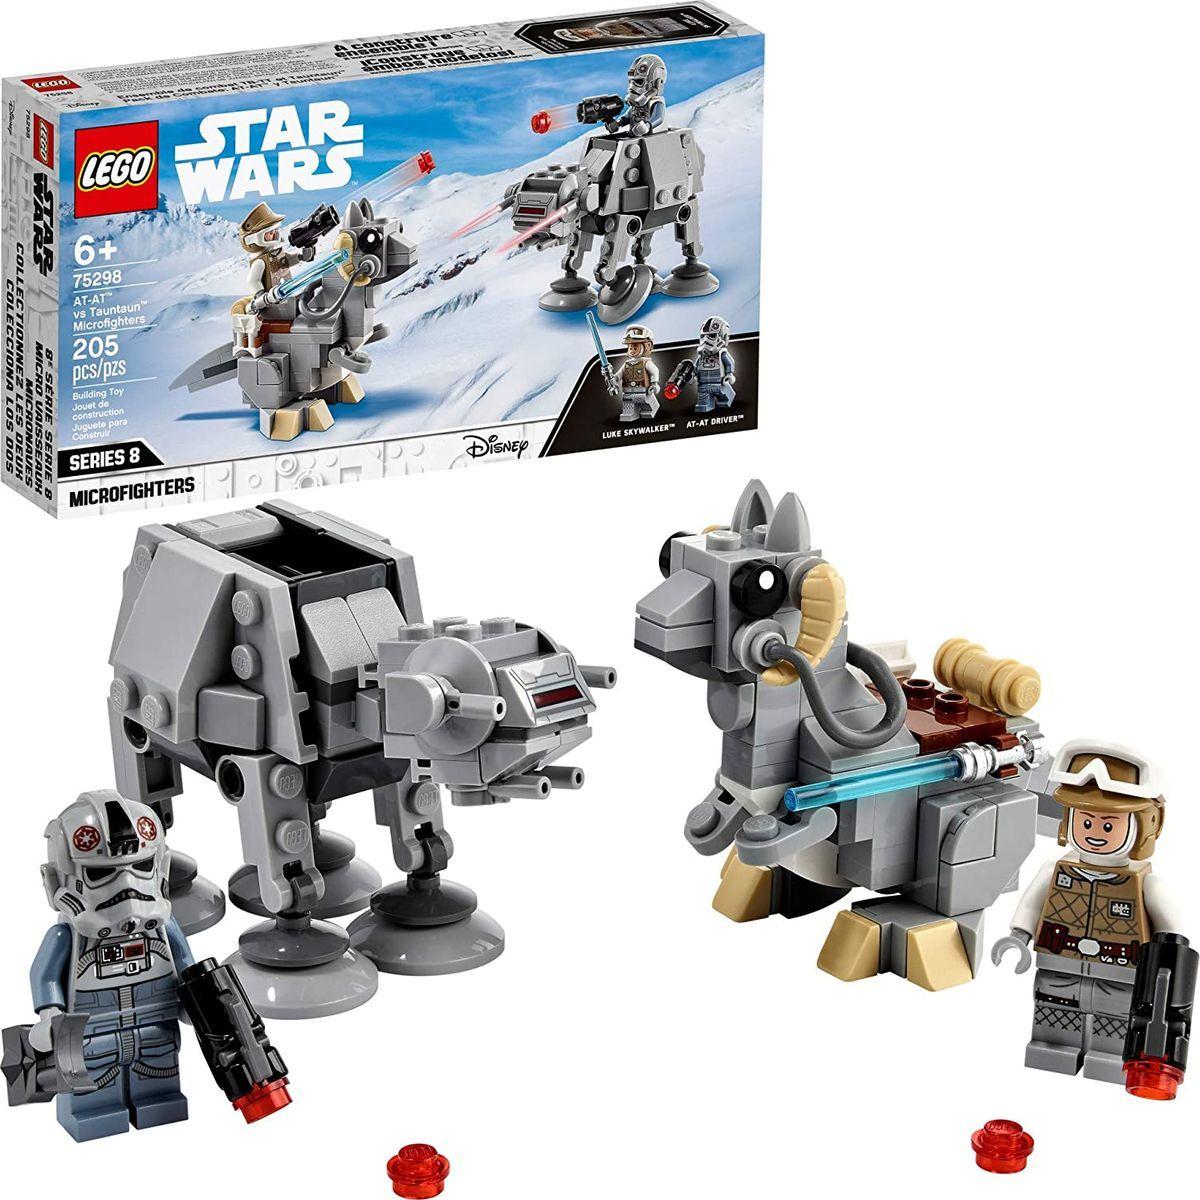 LEGO® Star Wars™ 75298 Mikrobojovníci AT-AT™ vs. Tauntaun